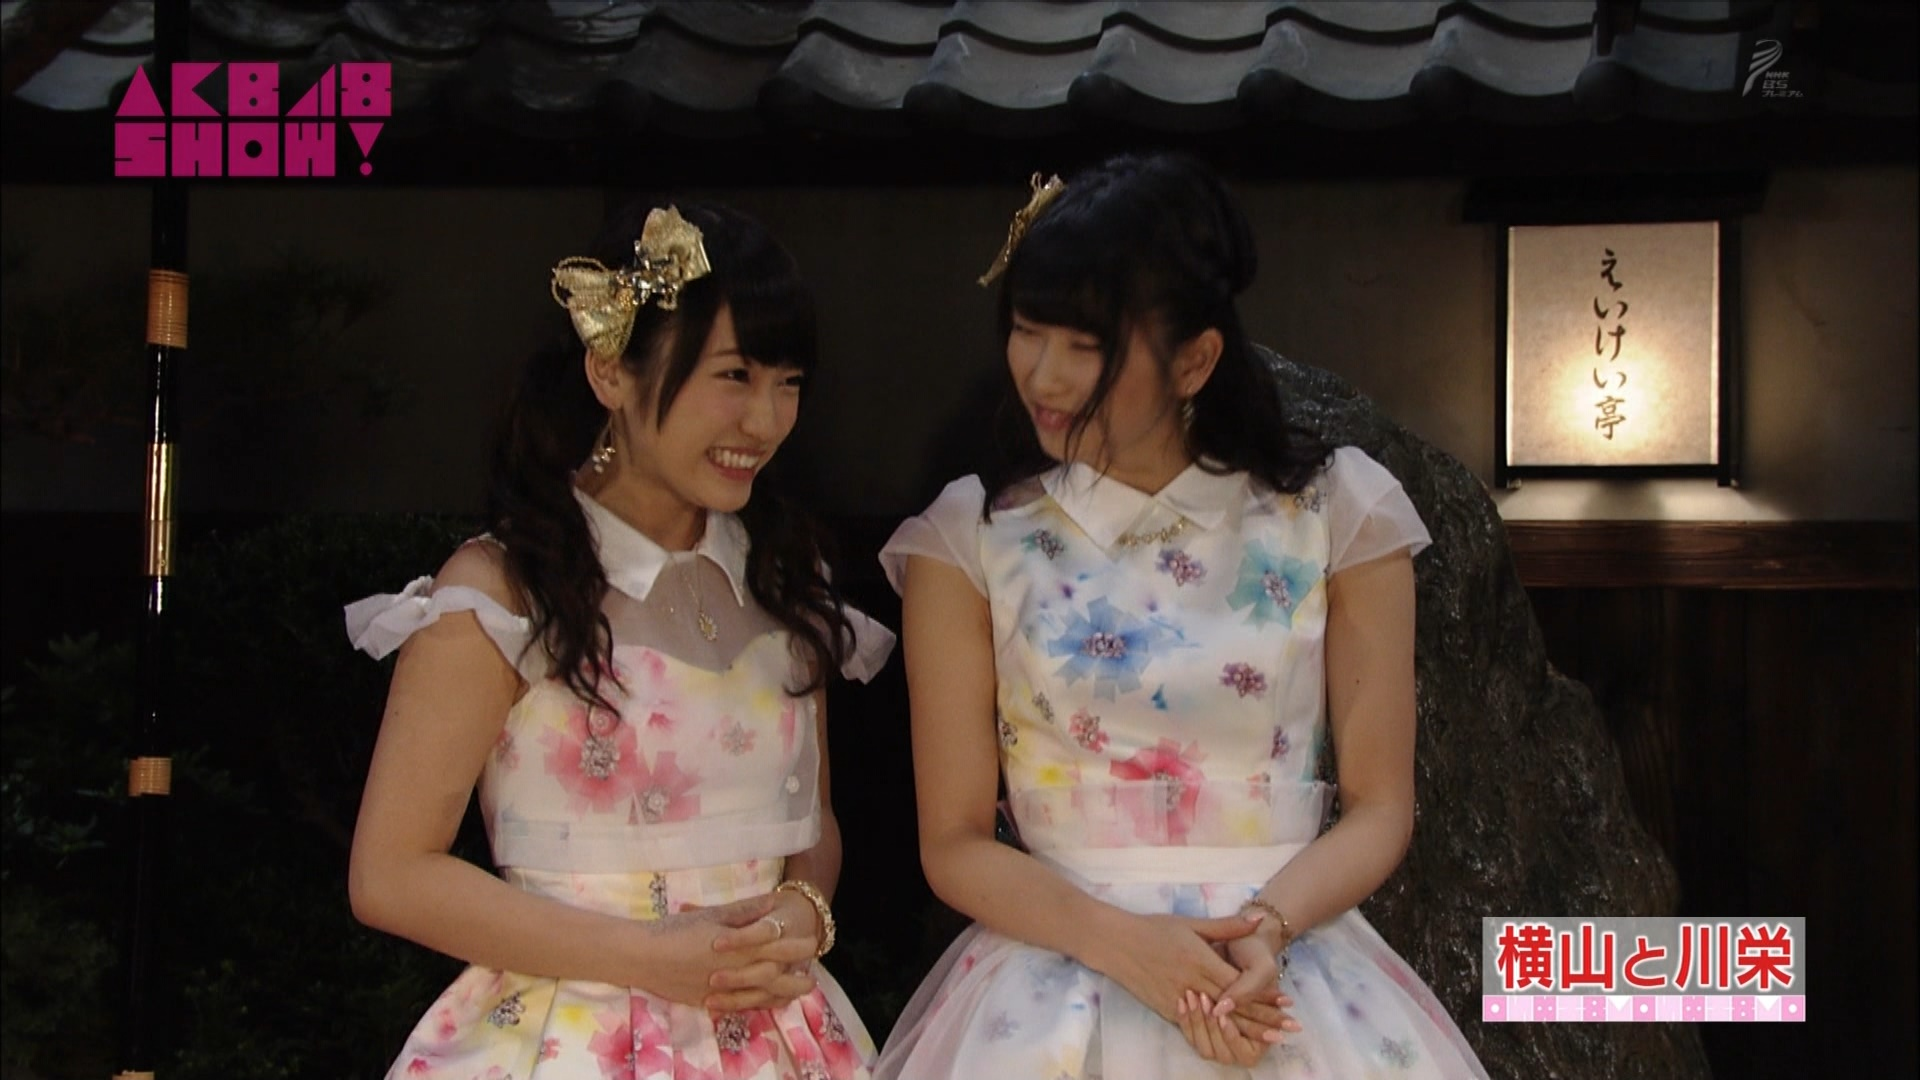 横山由依と川栄李奈 AKB48SHOW! 20140906 (7)